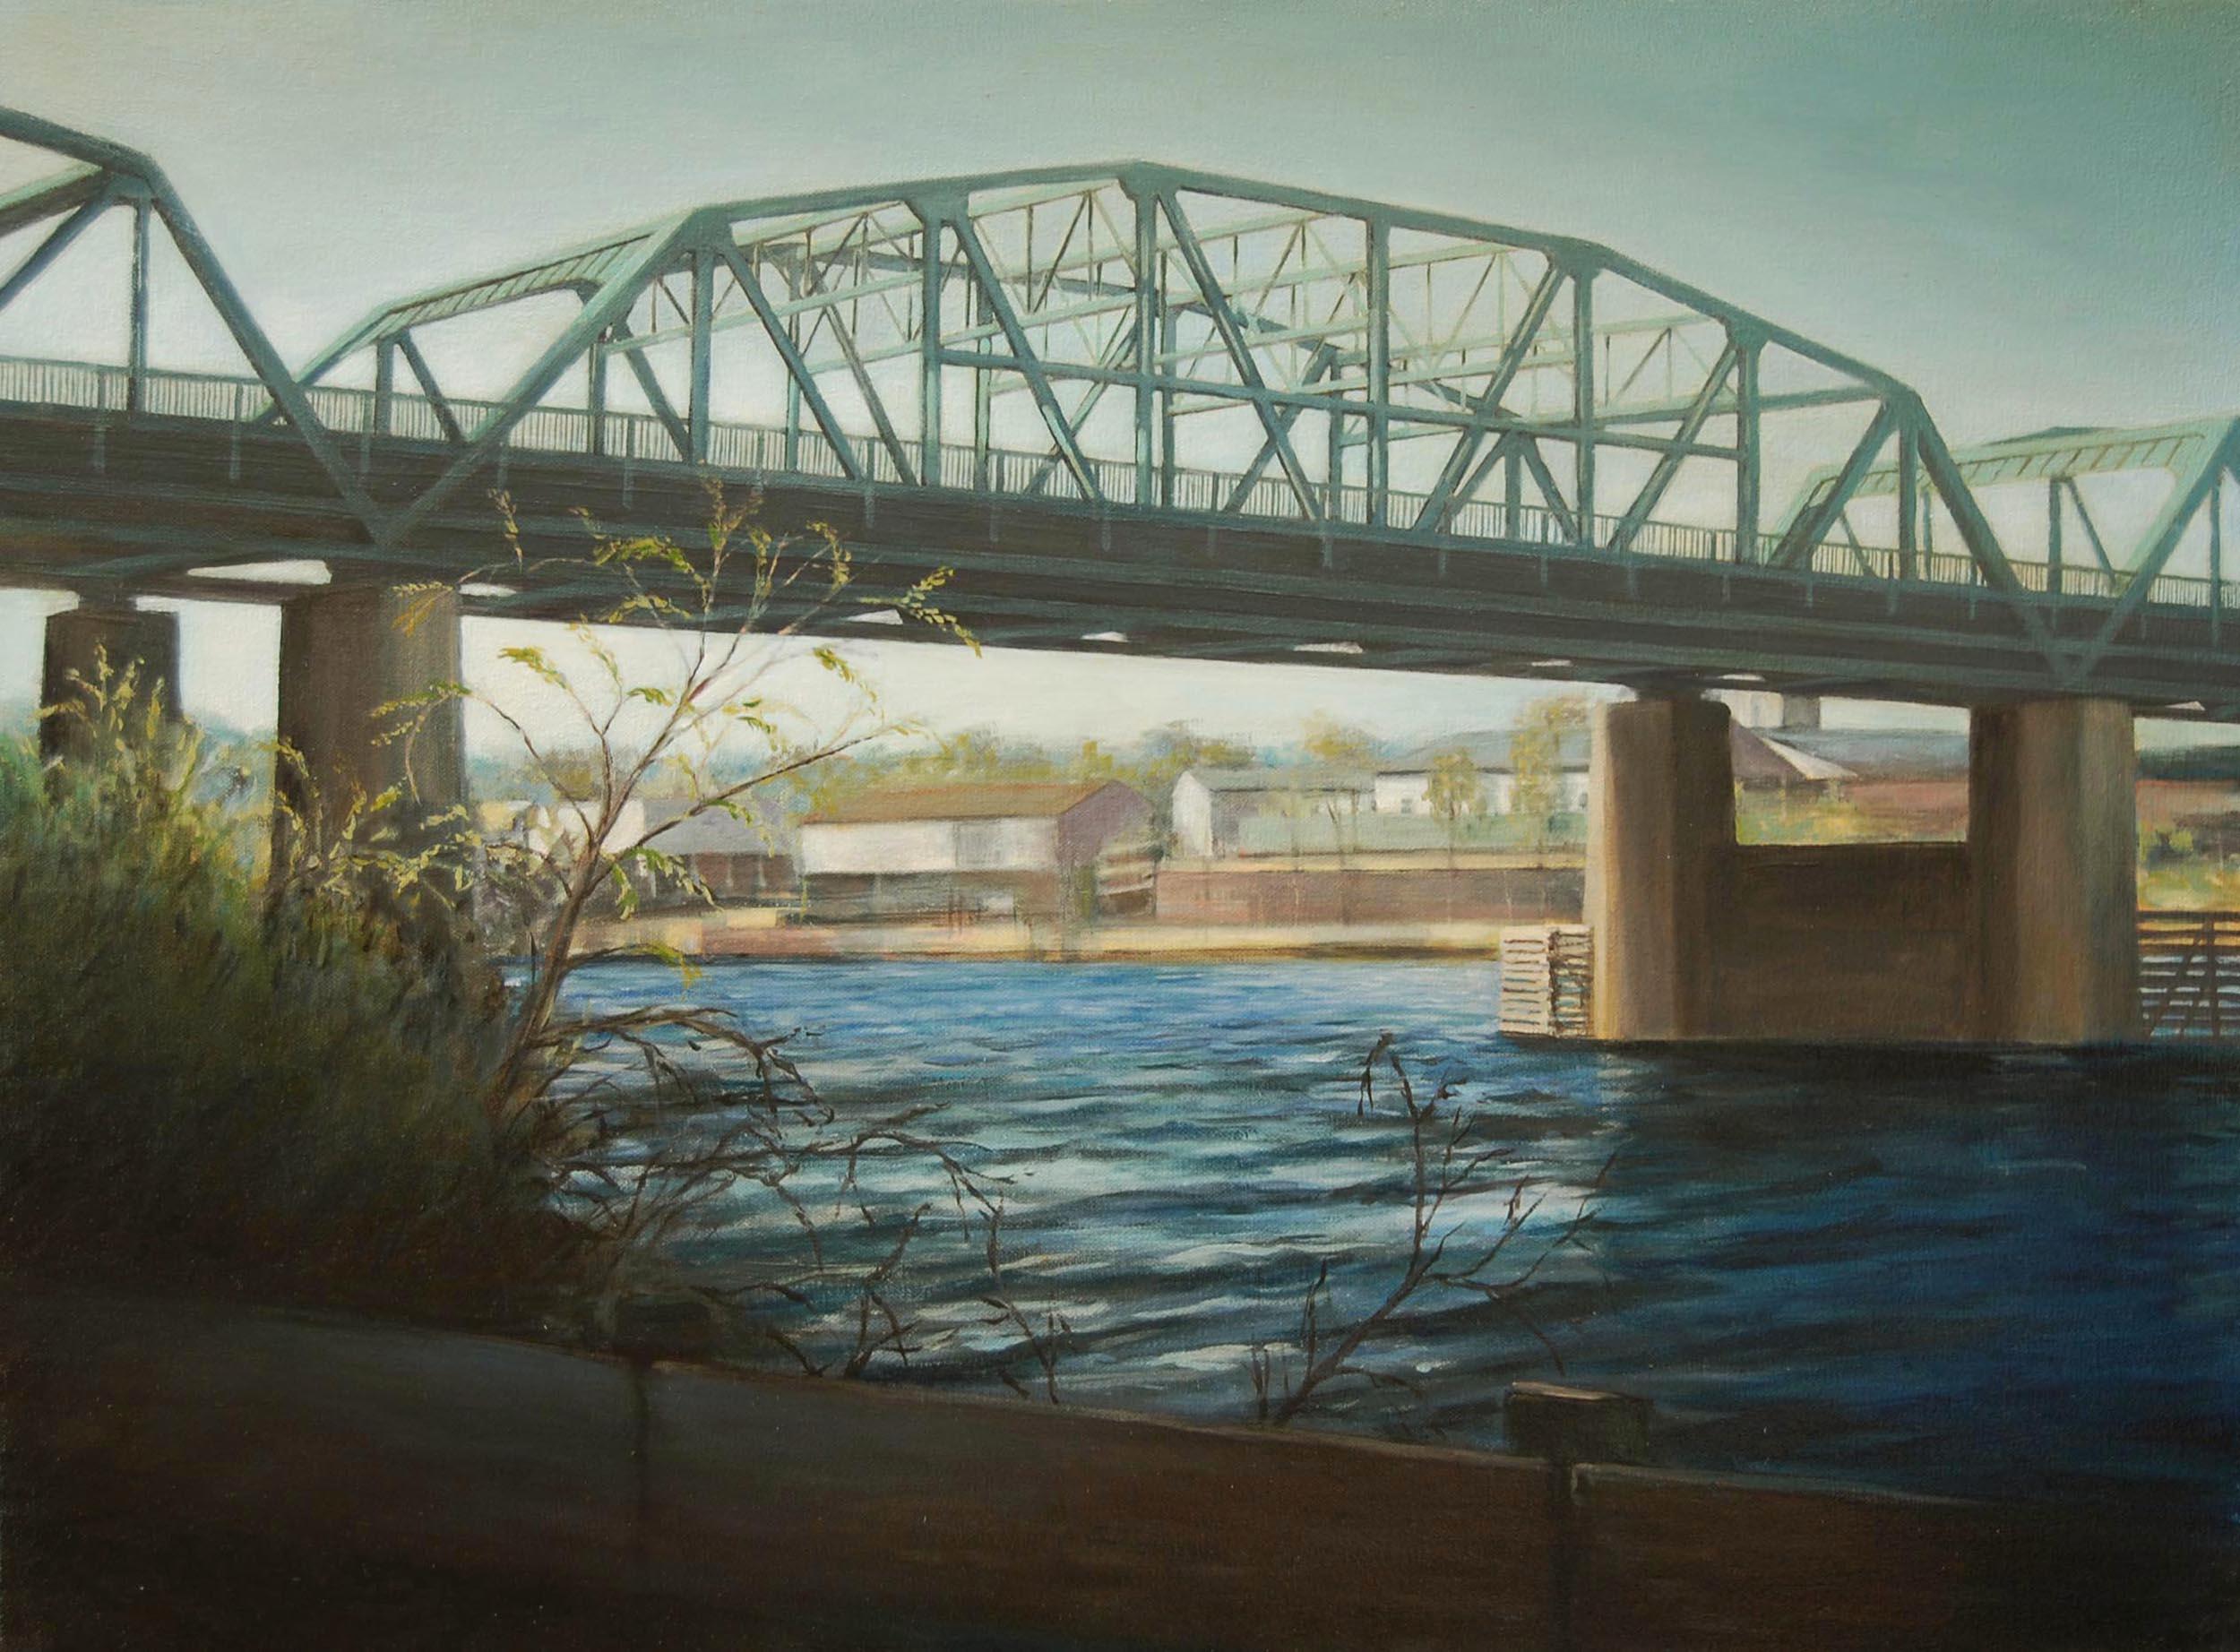 Lowry Avenue Bridge,    Minneapolis   2008  Oil on canvas  18 x 24 inches